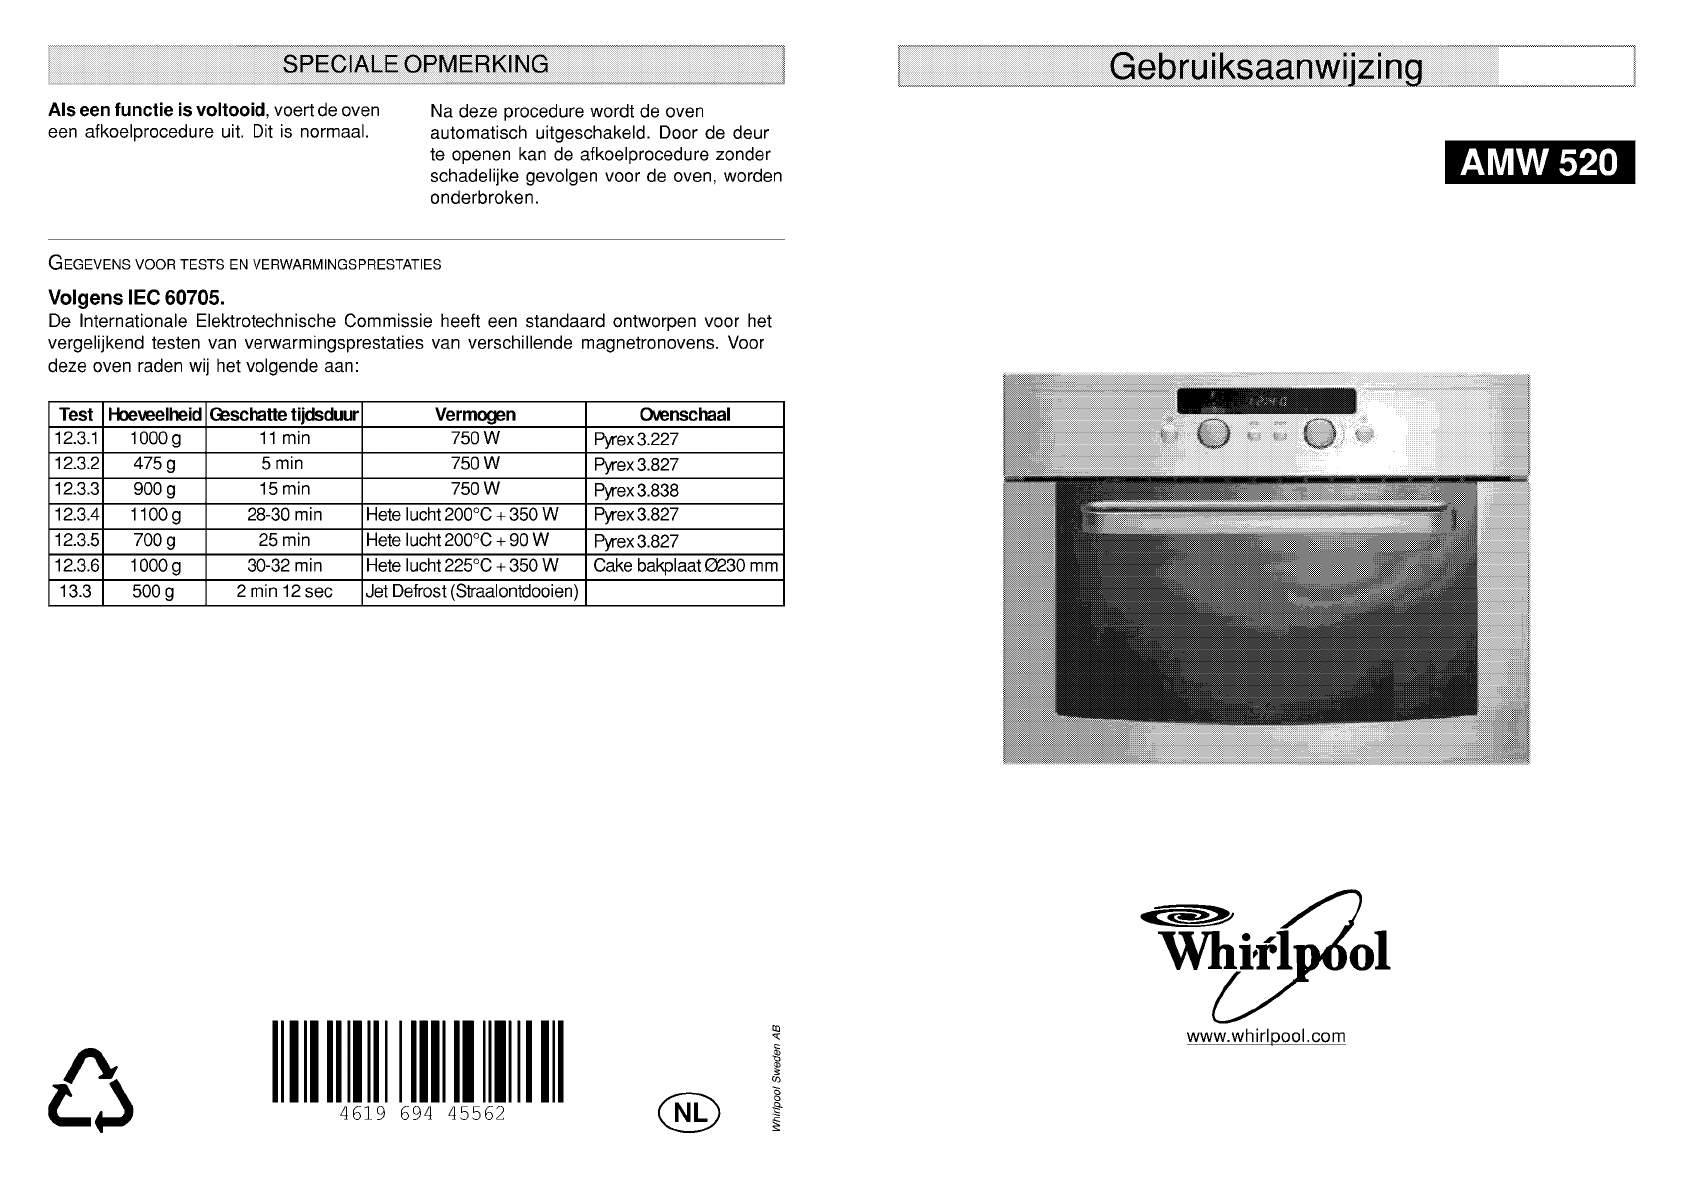 Whirlpool oven handleiding